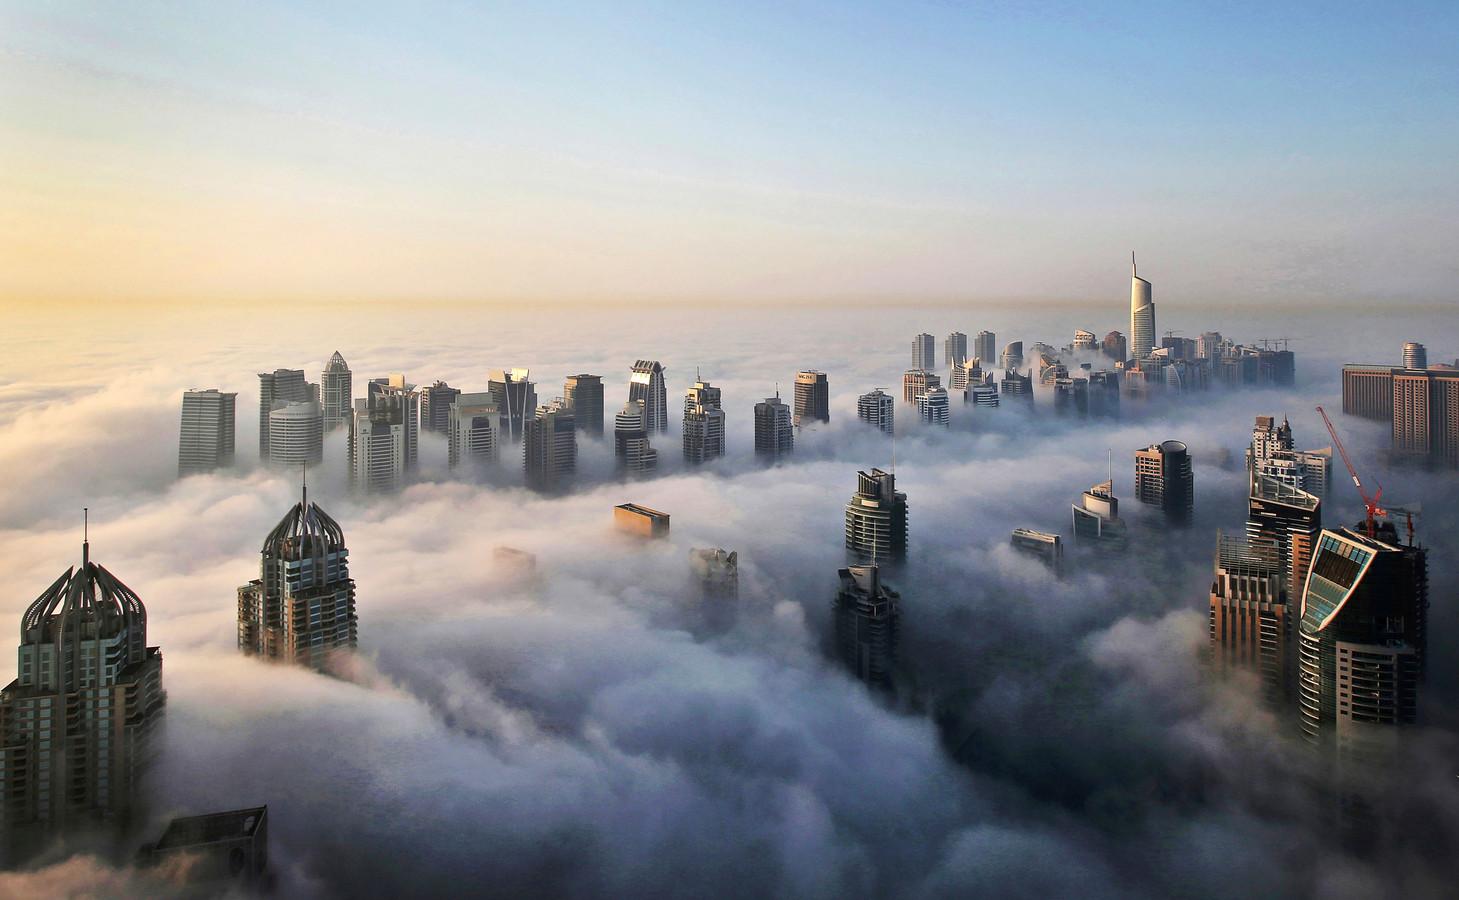 Toppen van wolkenkrabbers boven de wolken in Dubai.